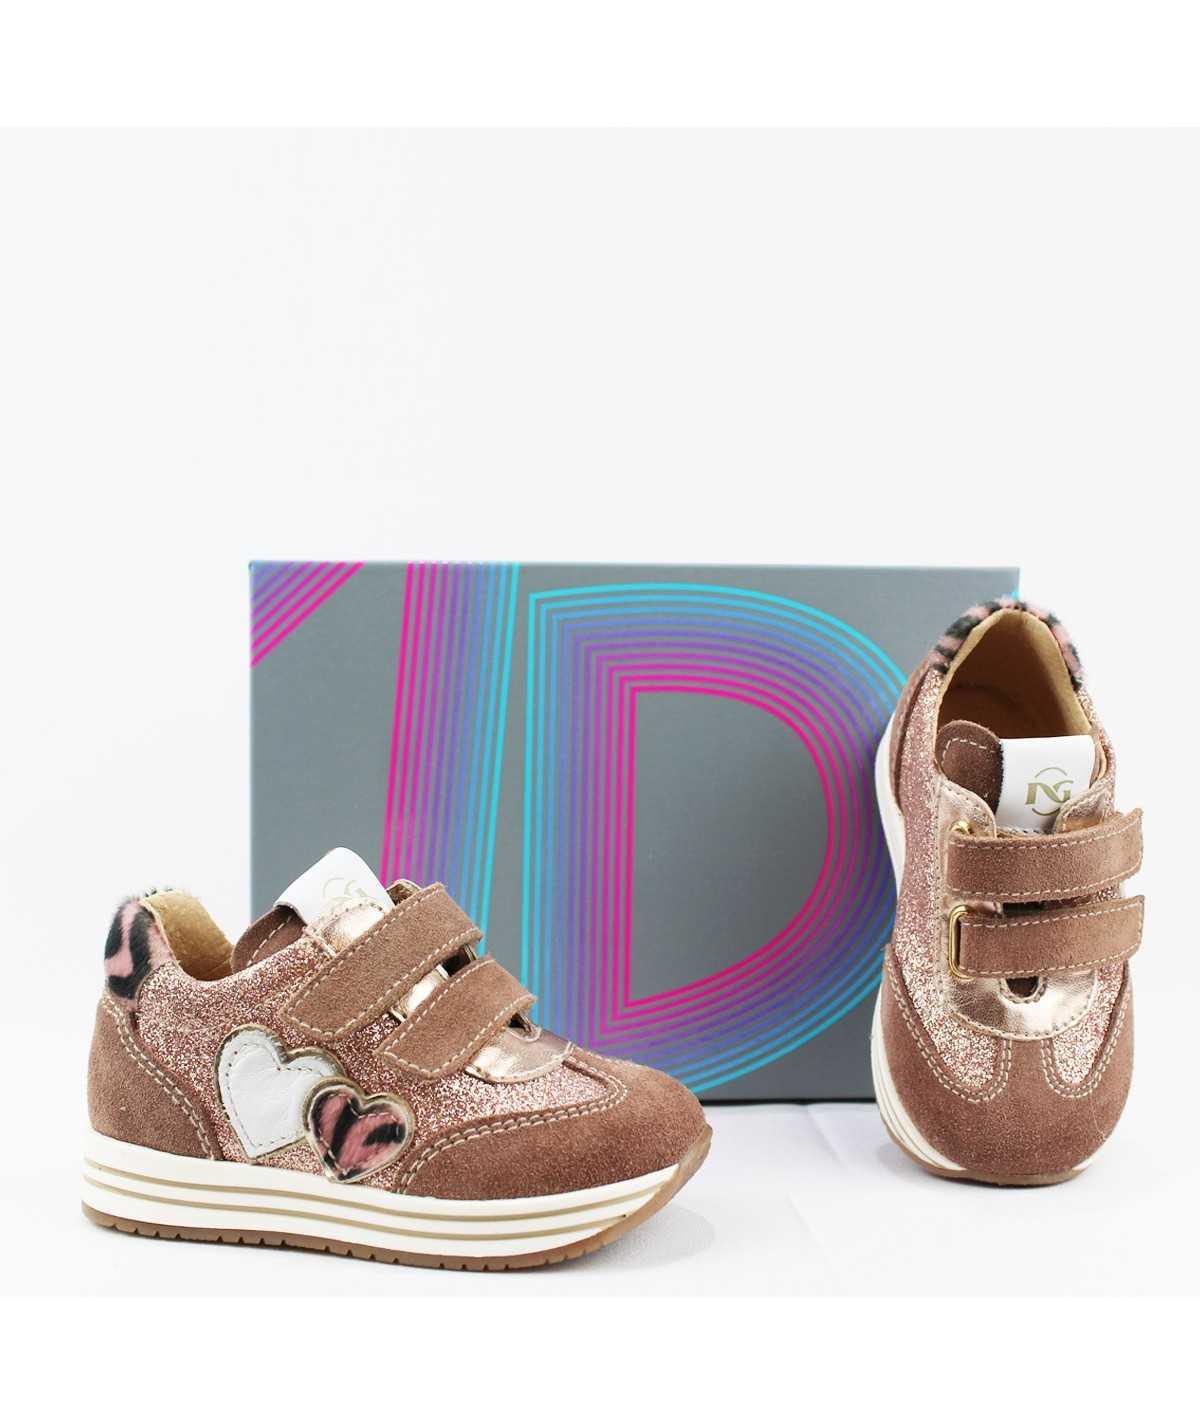 NEROGIARDINI Sneakers 20/26